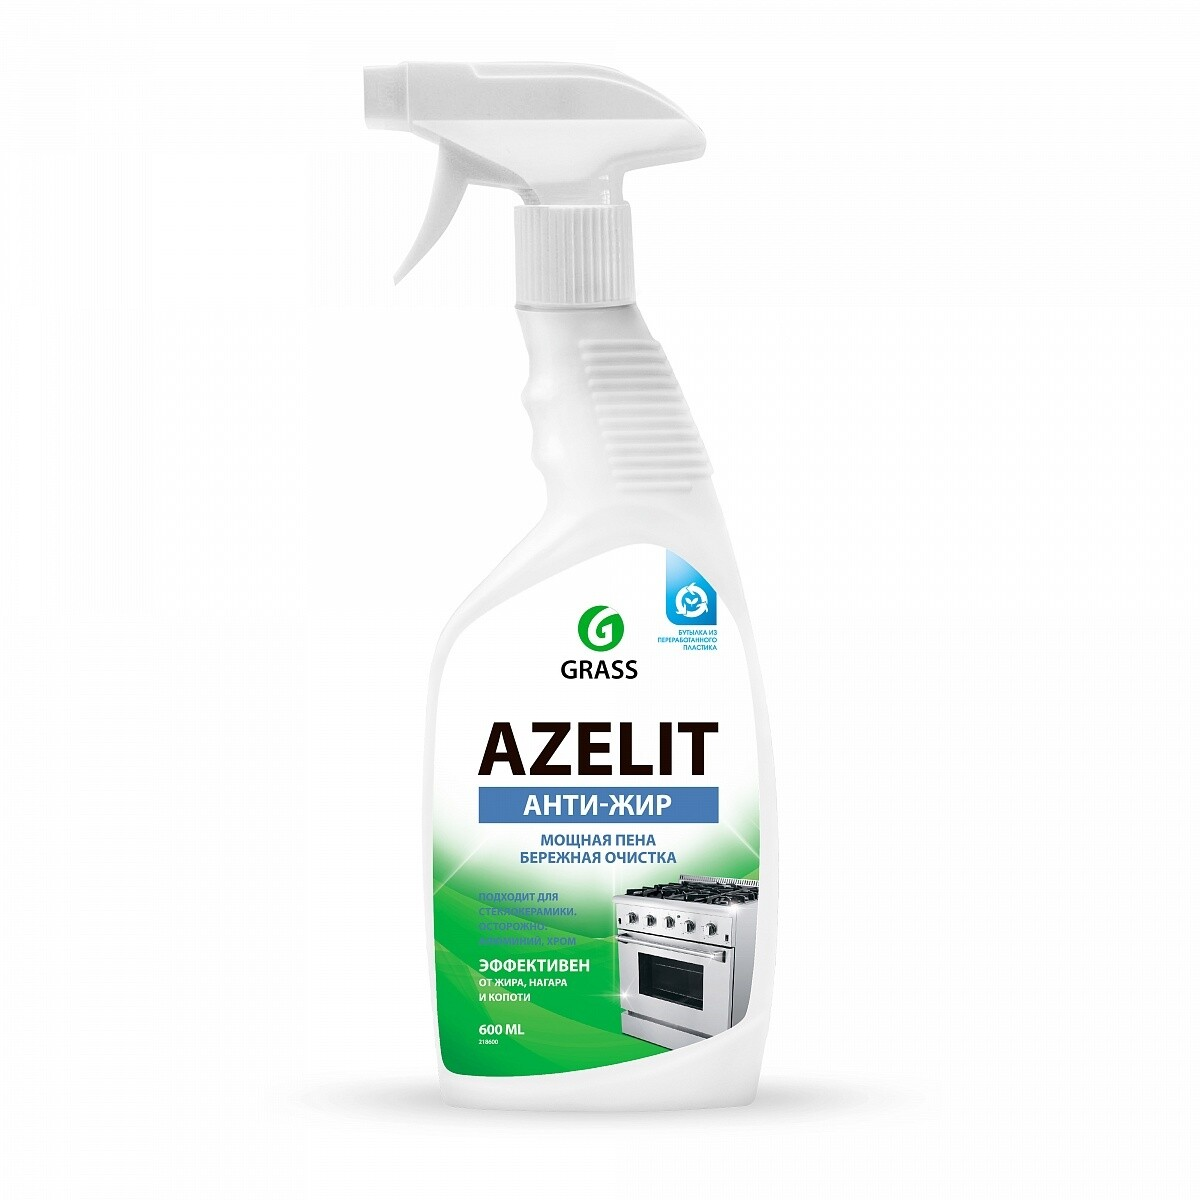 Kitchen cleaner Azelit, 600 ml